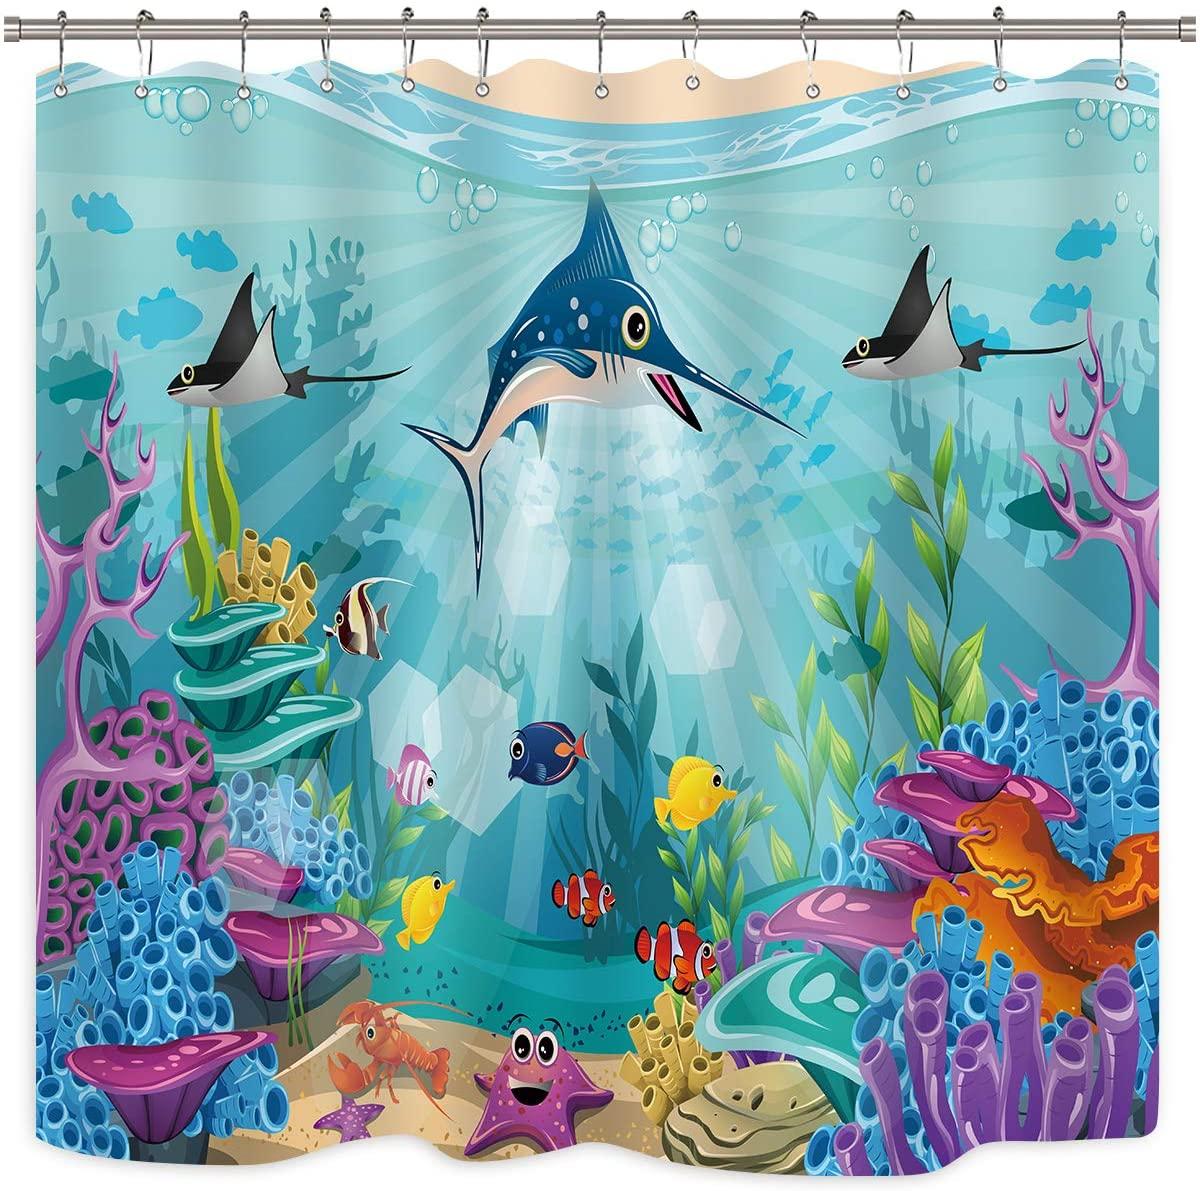 Riyidecor Tropical Shark Shower Curtain Coral Undersea World Animal Starfish Cartoon Fish Colorful Kid Plant Scenery Nature Fabric Waterproof Home Bathtub Decor 12 Pack Plastic Hooks 72x72 Inch